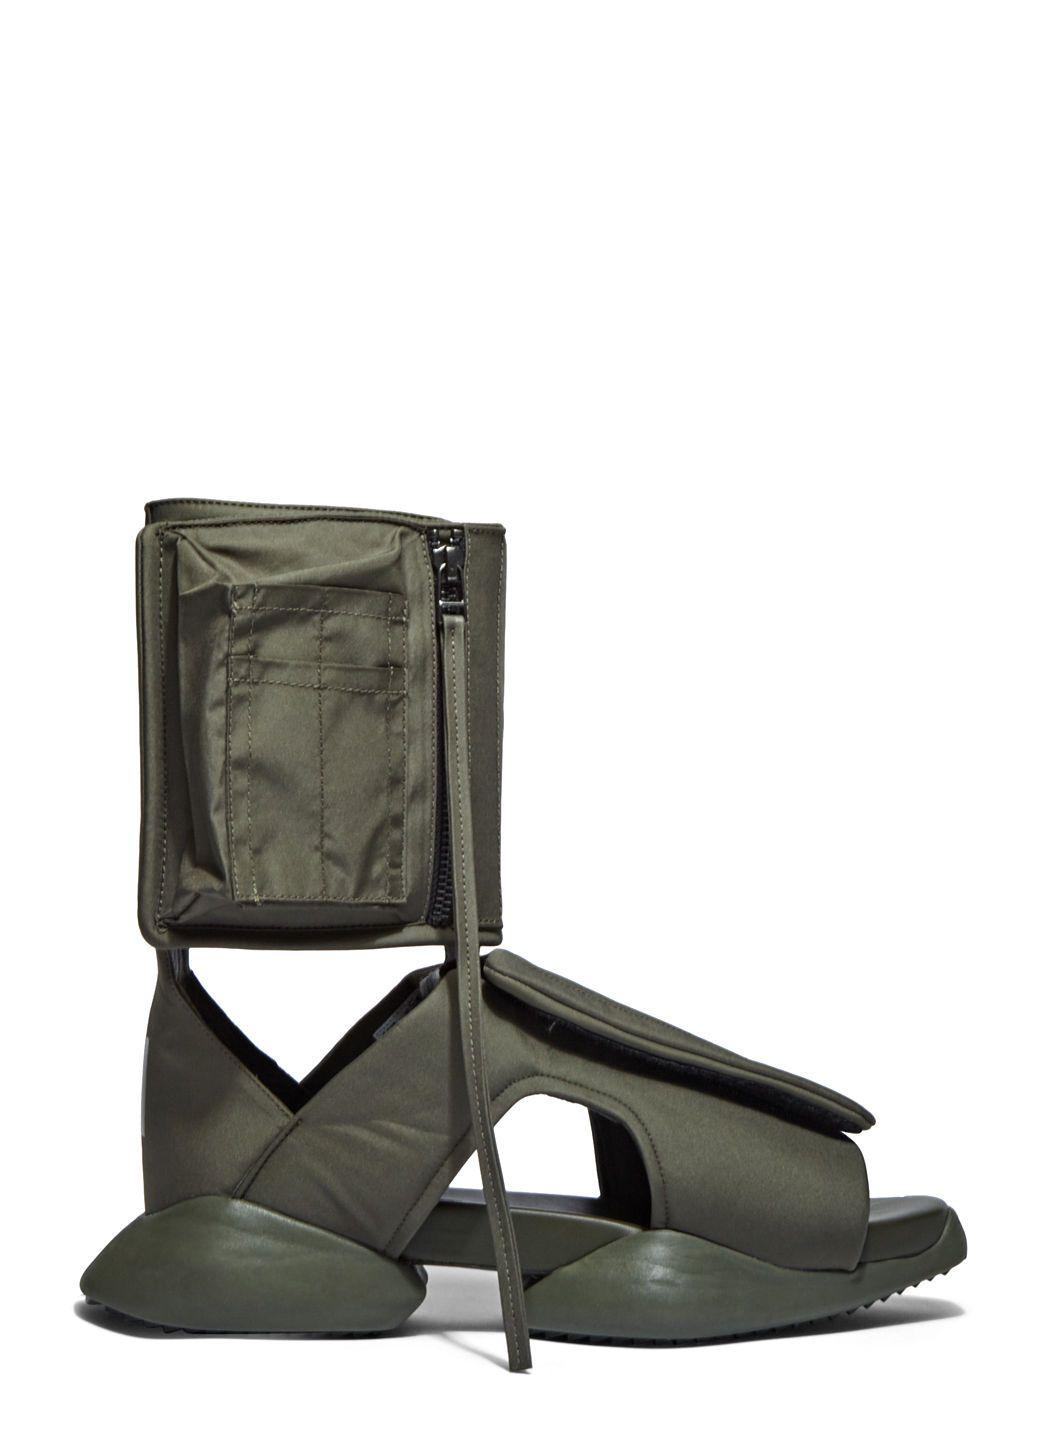 3a864f73e RICK OWENS X Adidas Men S Velcro Strap Ro Cargo Sandals In Khaki.  rickowens   shoes